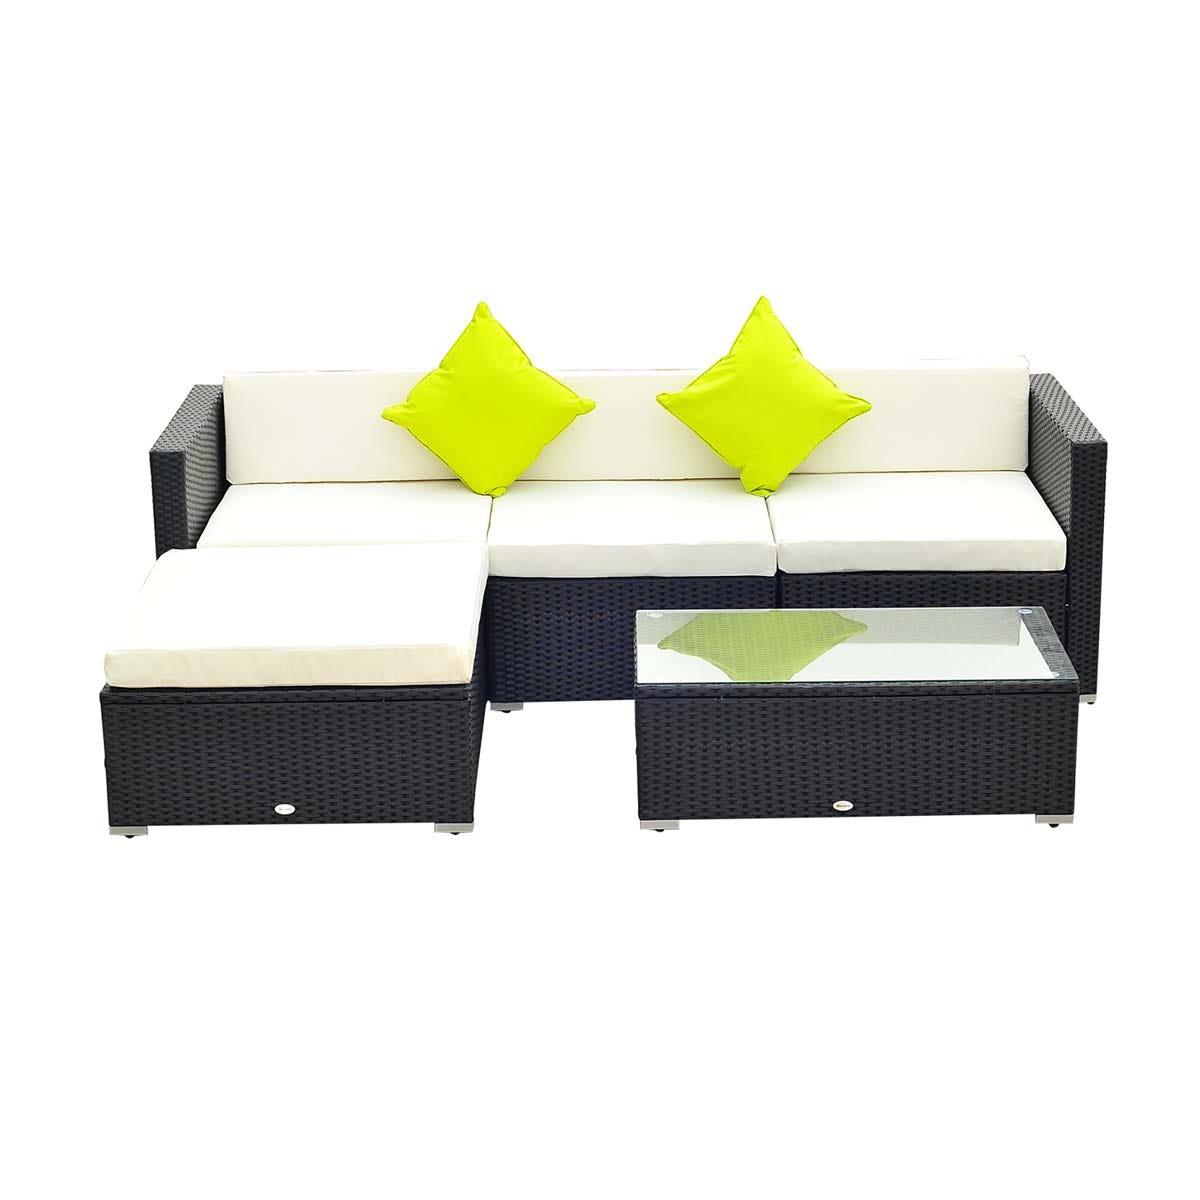 Outsunny 5 Piece Modular Rattan Sofa Set - Black